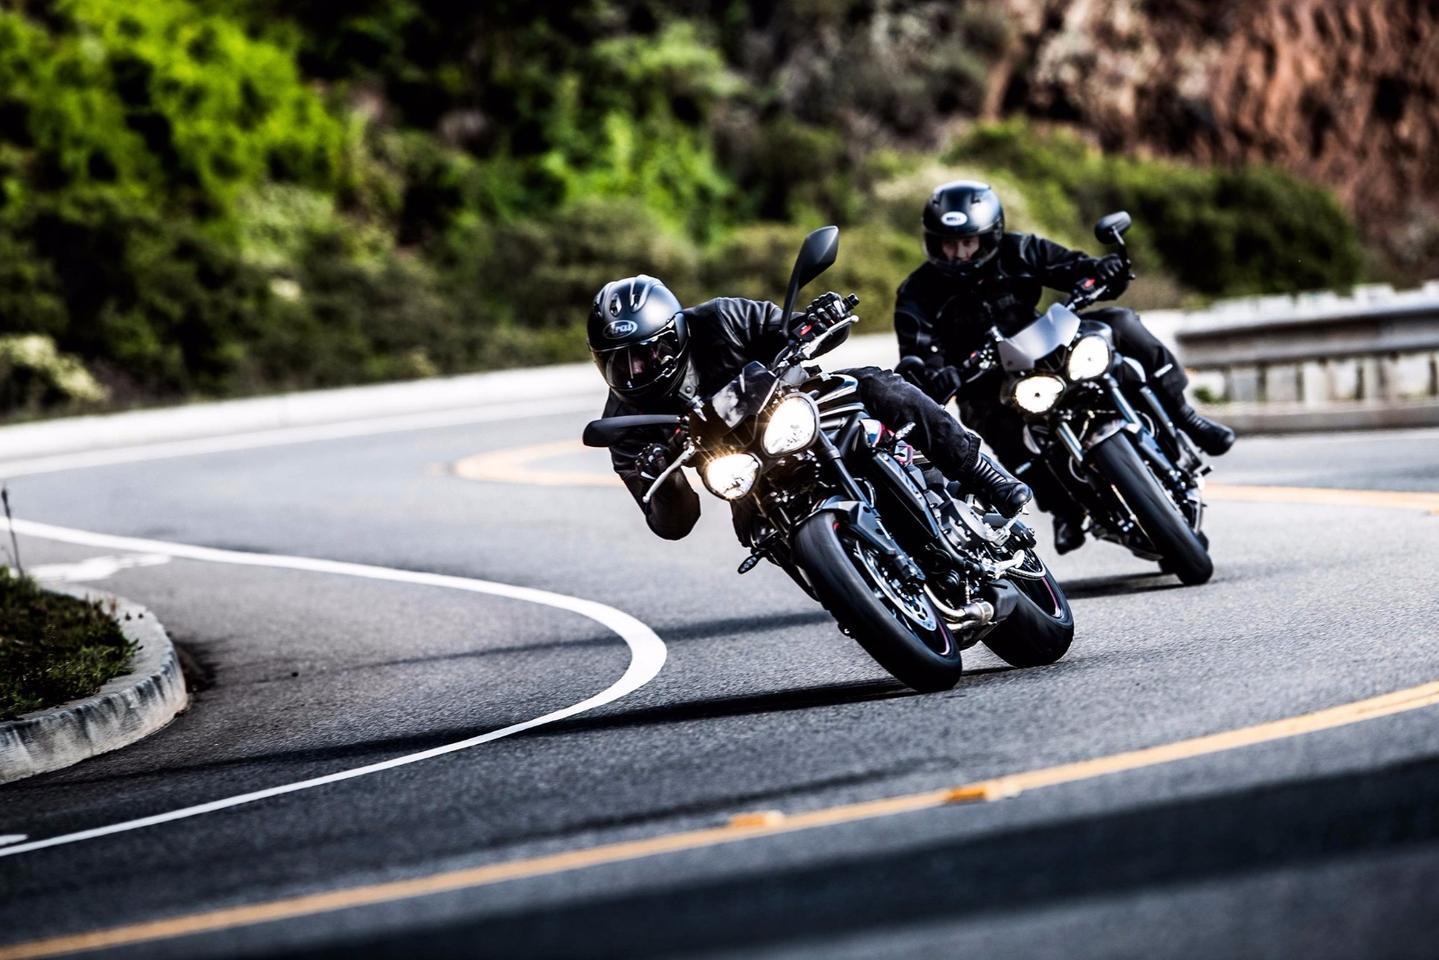 2017 Triumph Street Triple RS studio 3/4 view   Triumph